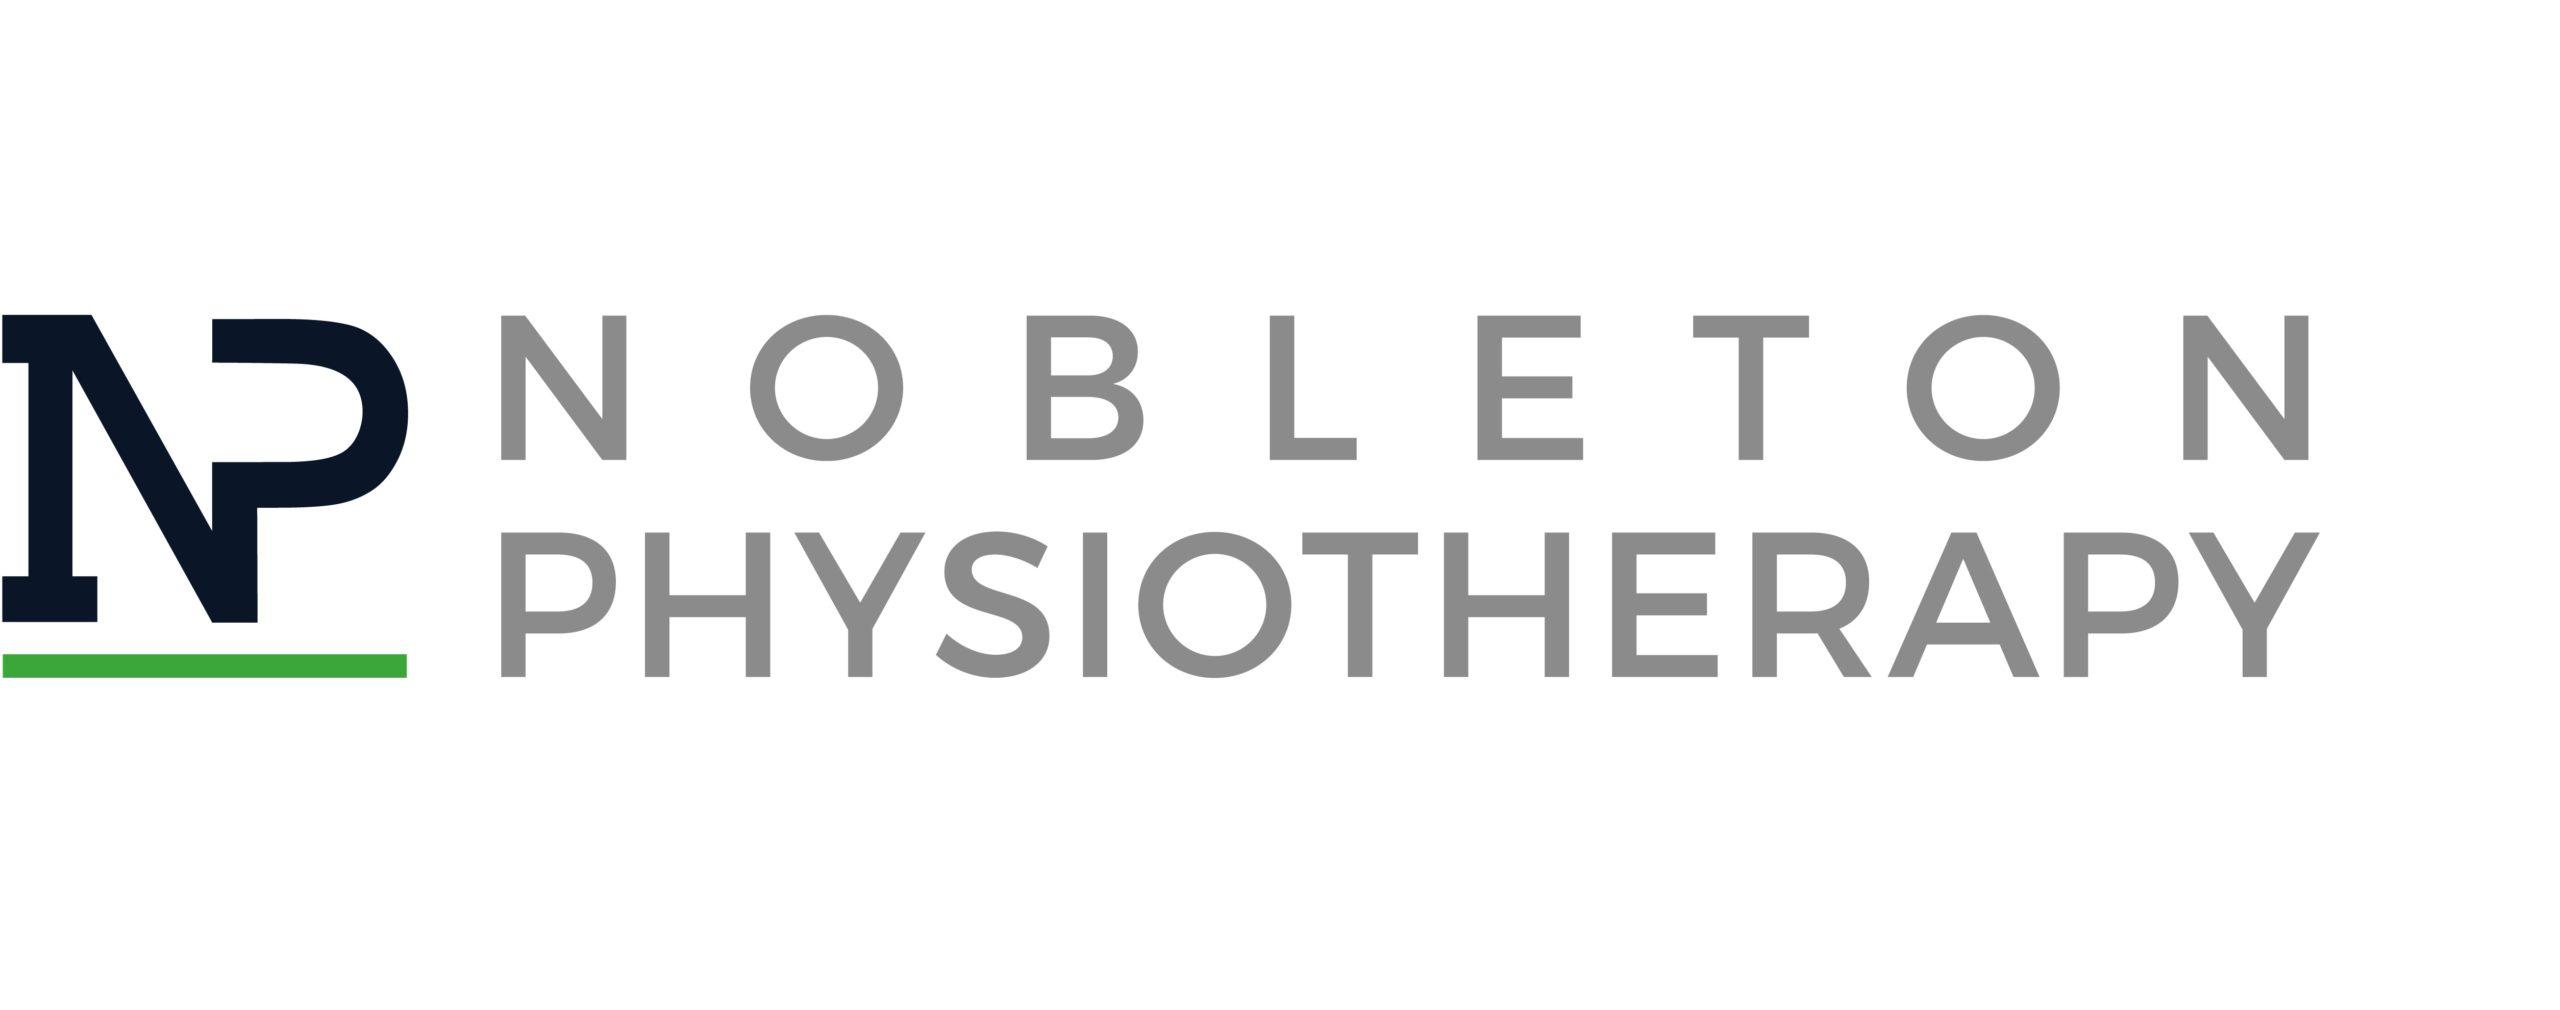 Nobleton Physiotherapy